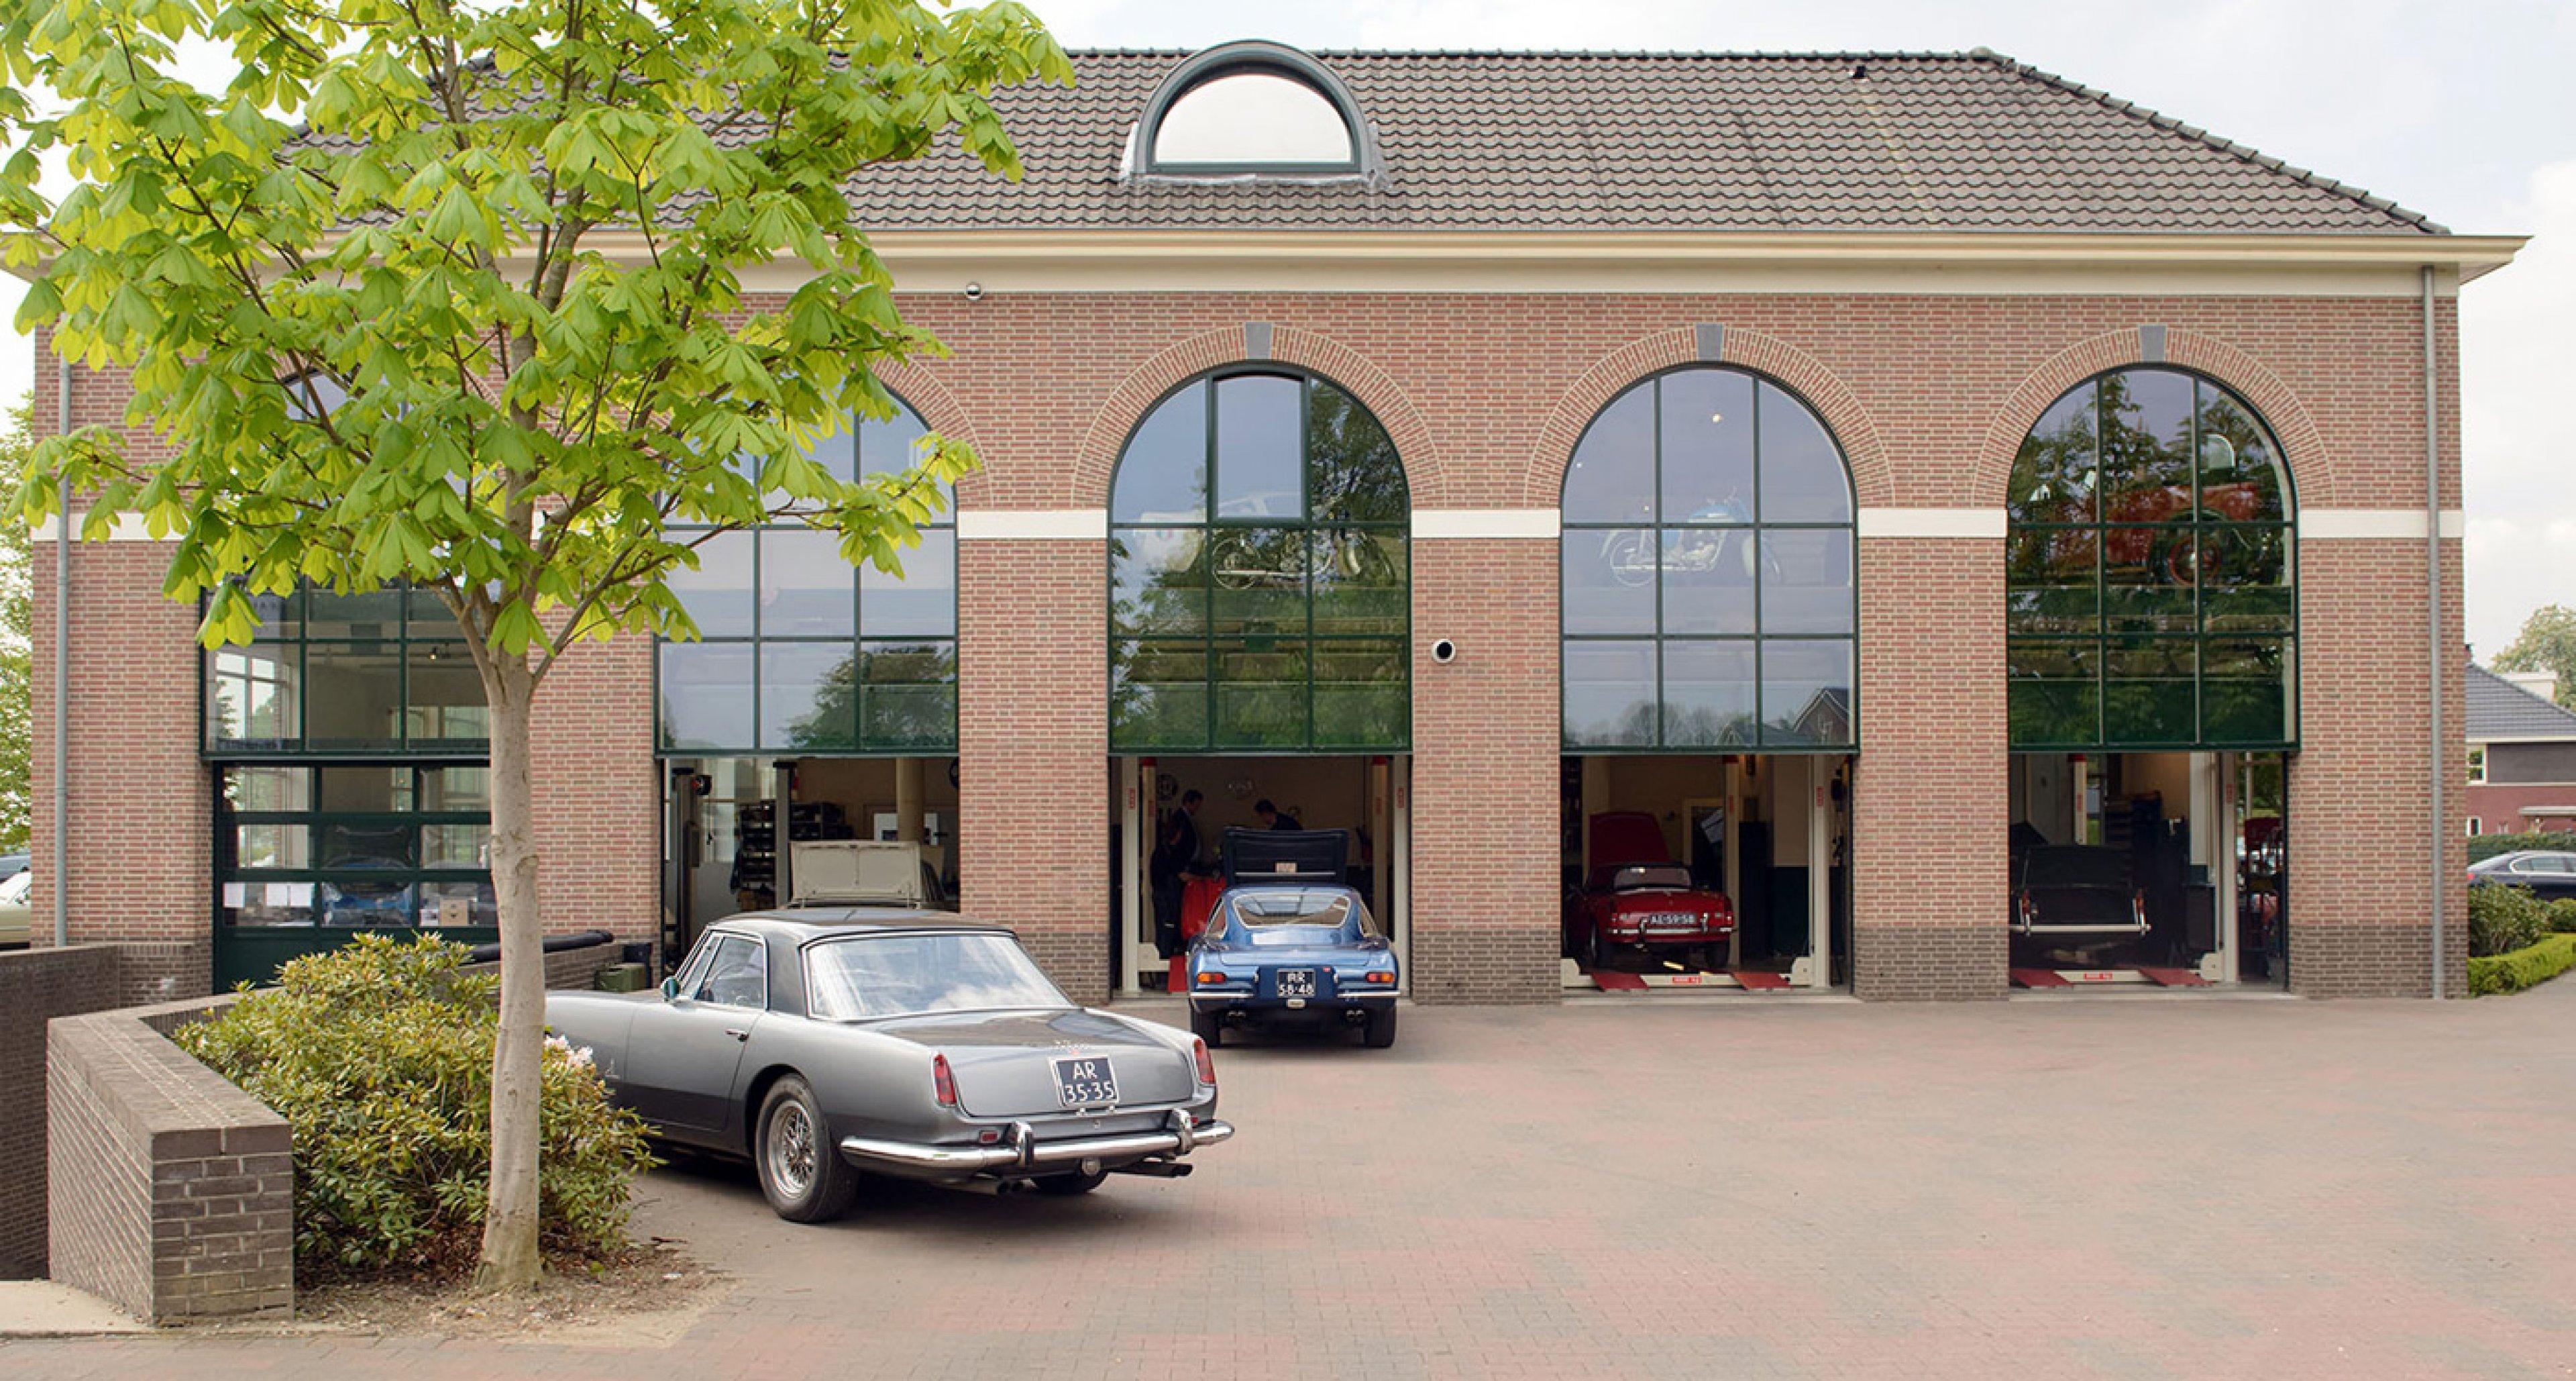 The Gallery Brummen